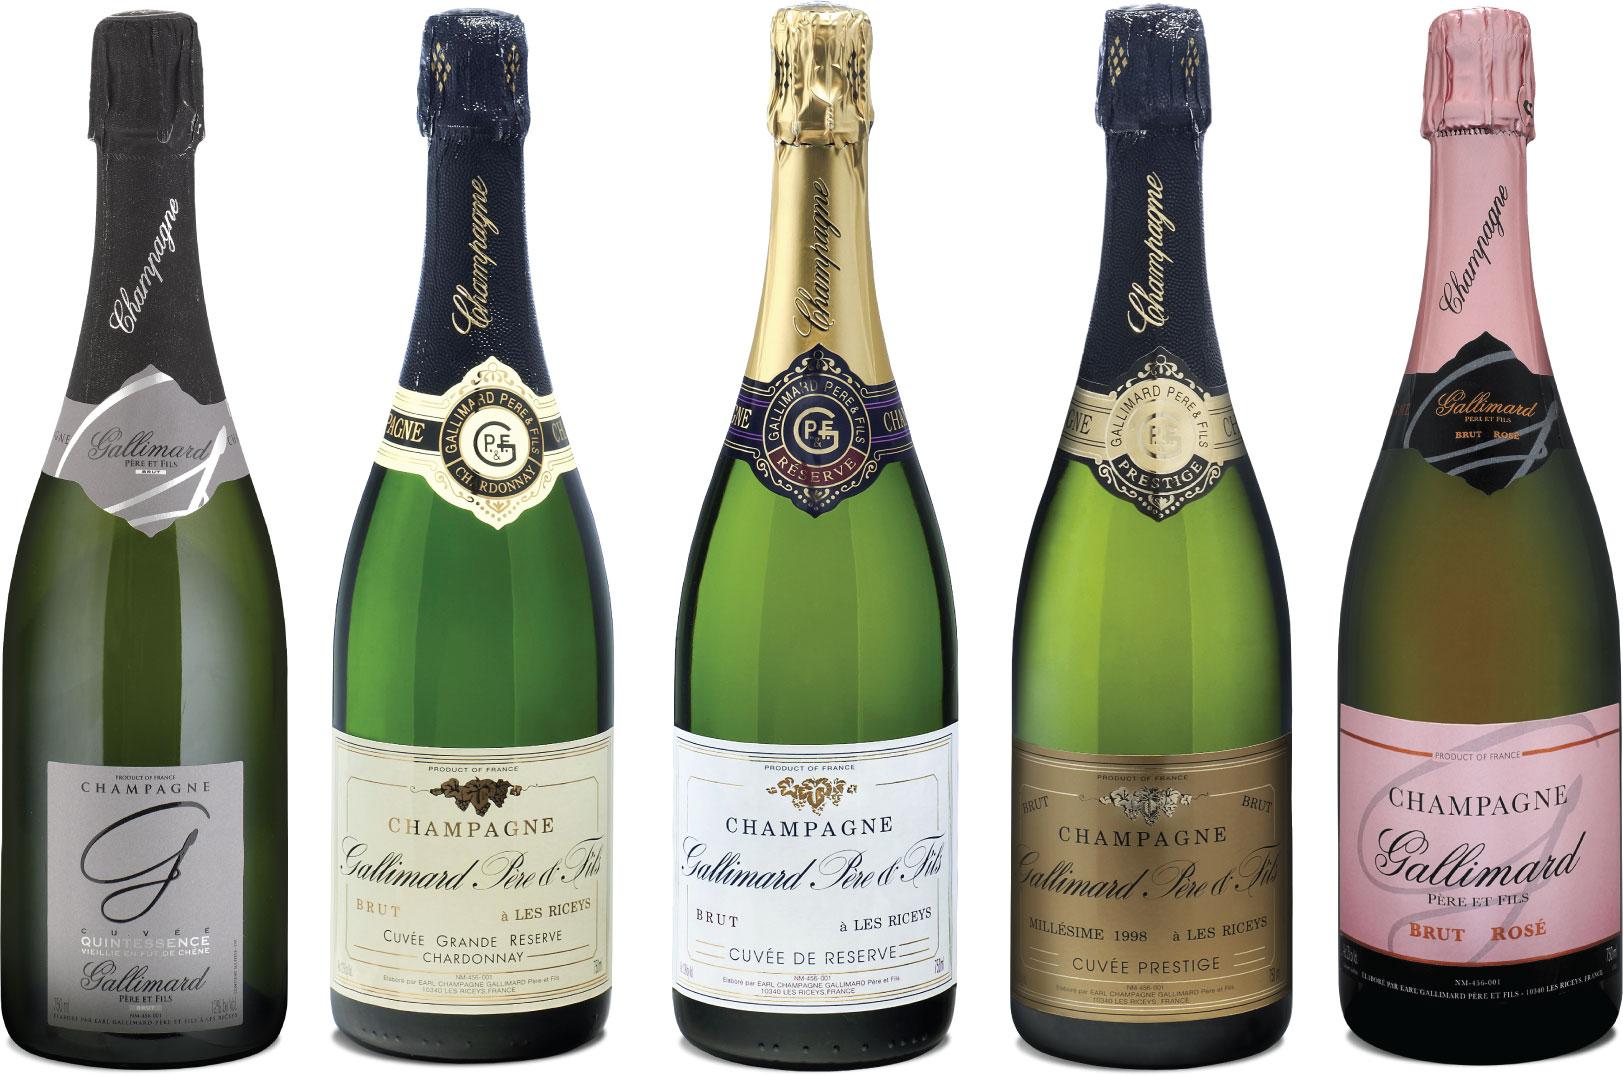 Champagner Gallimard